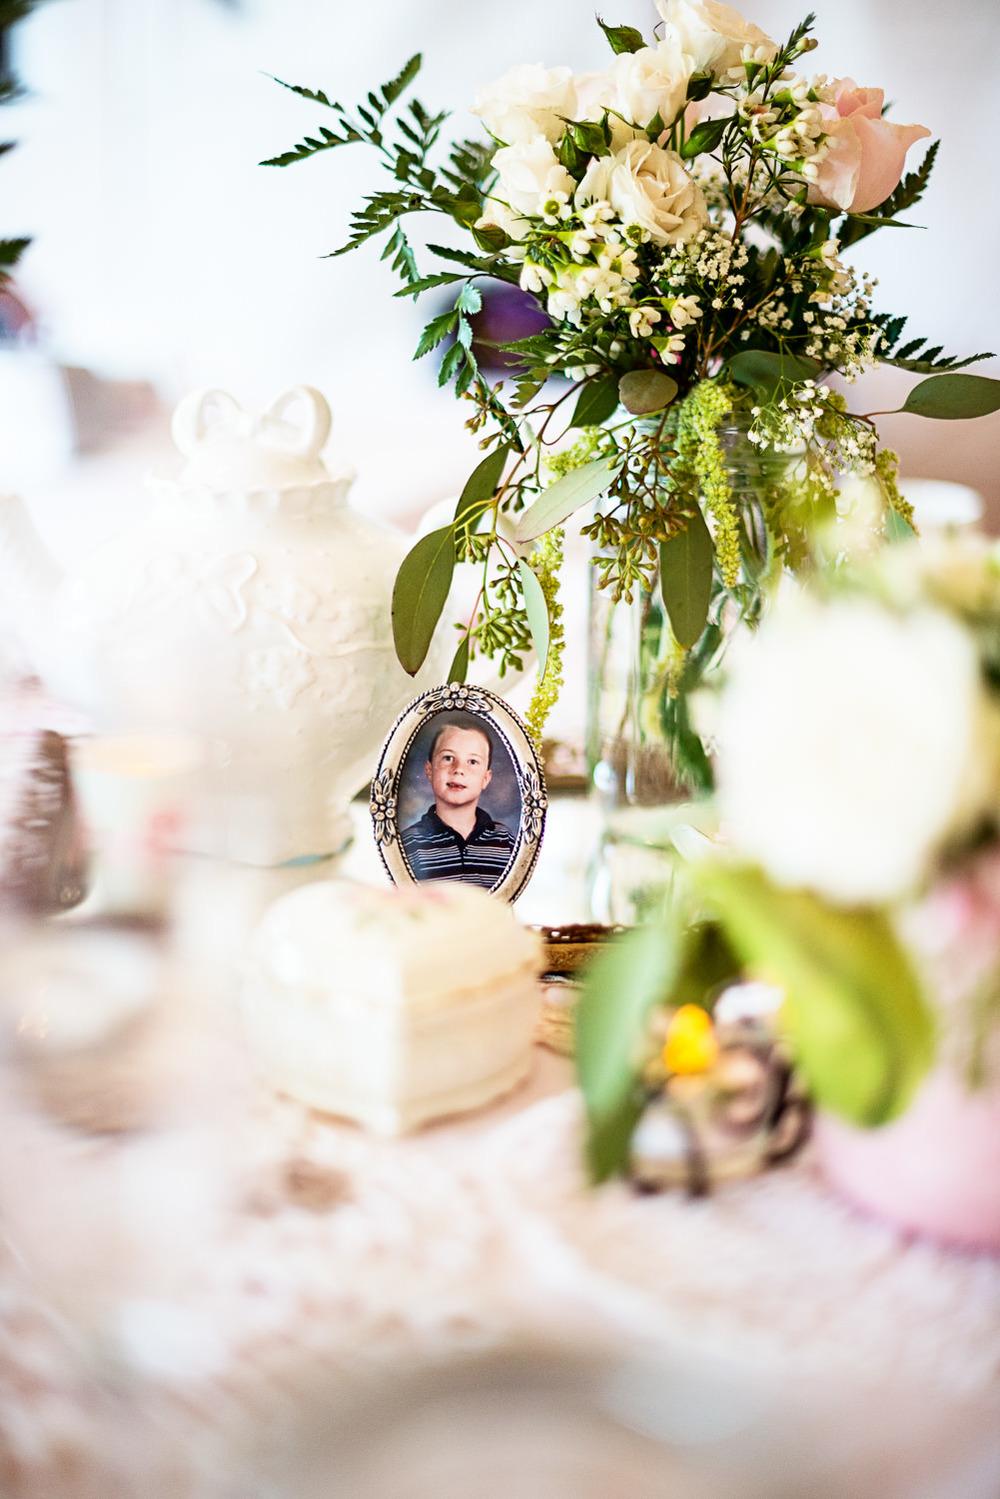 f27-Photography-Ojai-Wedding-February-2014-Table-Arrangement-Flowers-Centerpiece-Detail